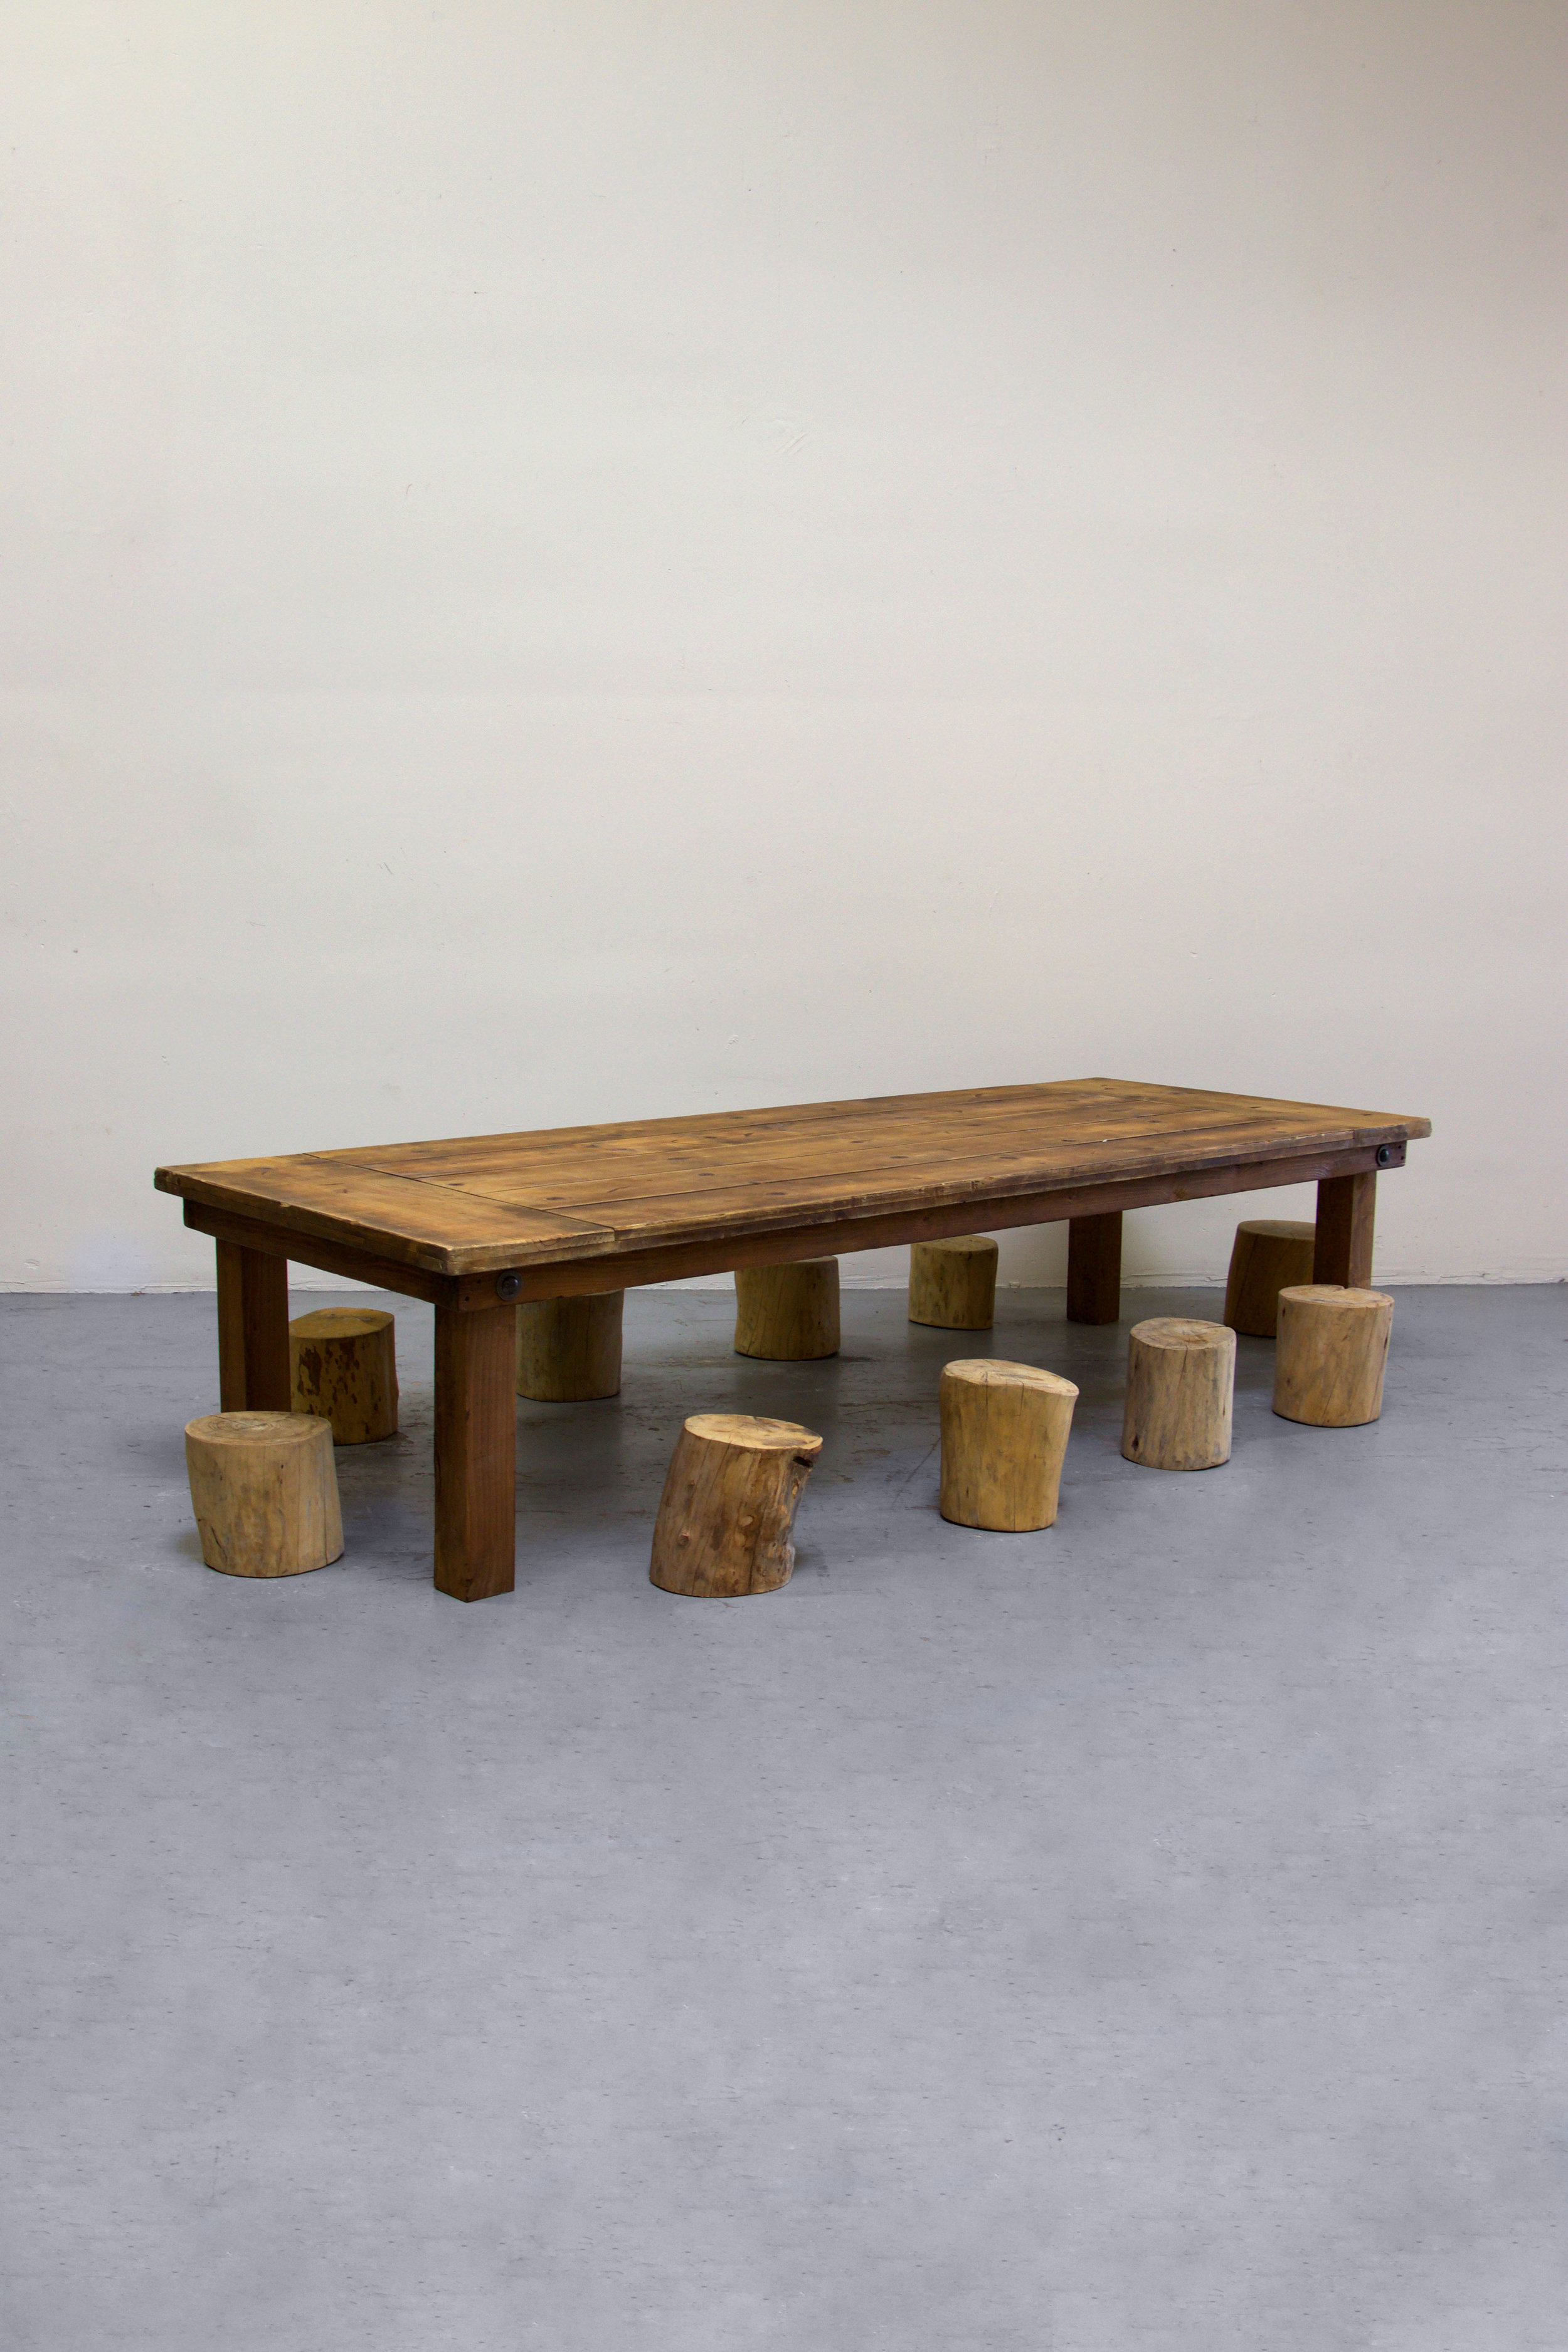 1 Kids Honey Brown Farm Table w/ 10 Tree Stumps